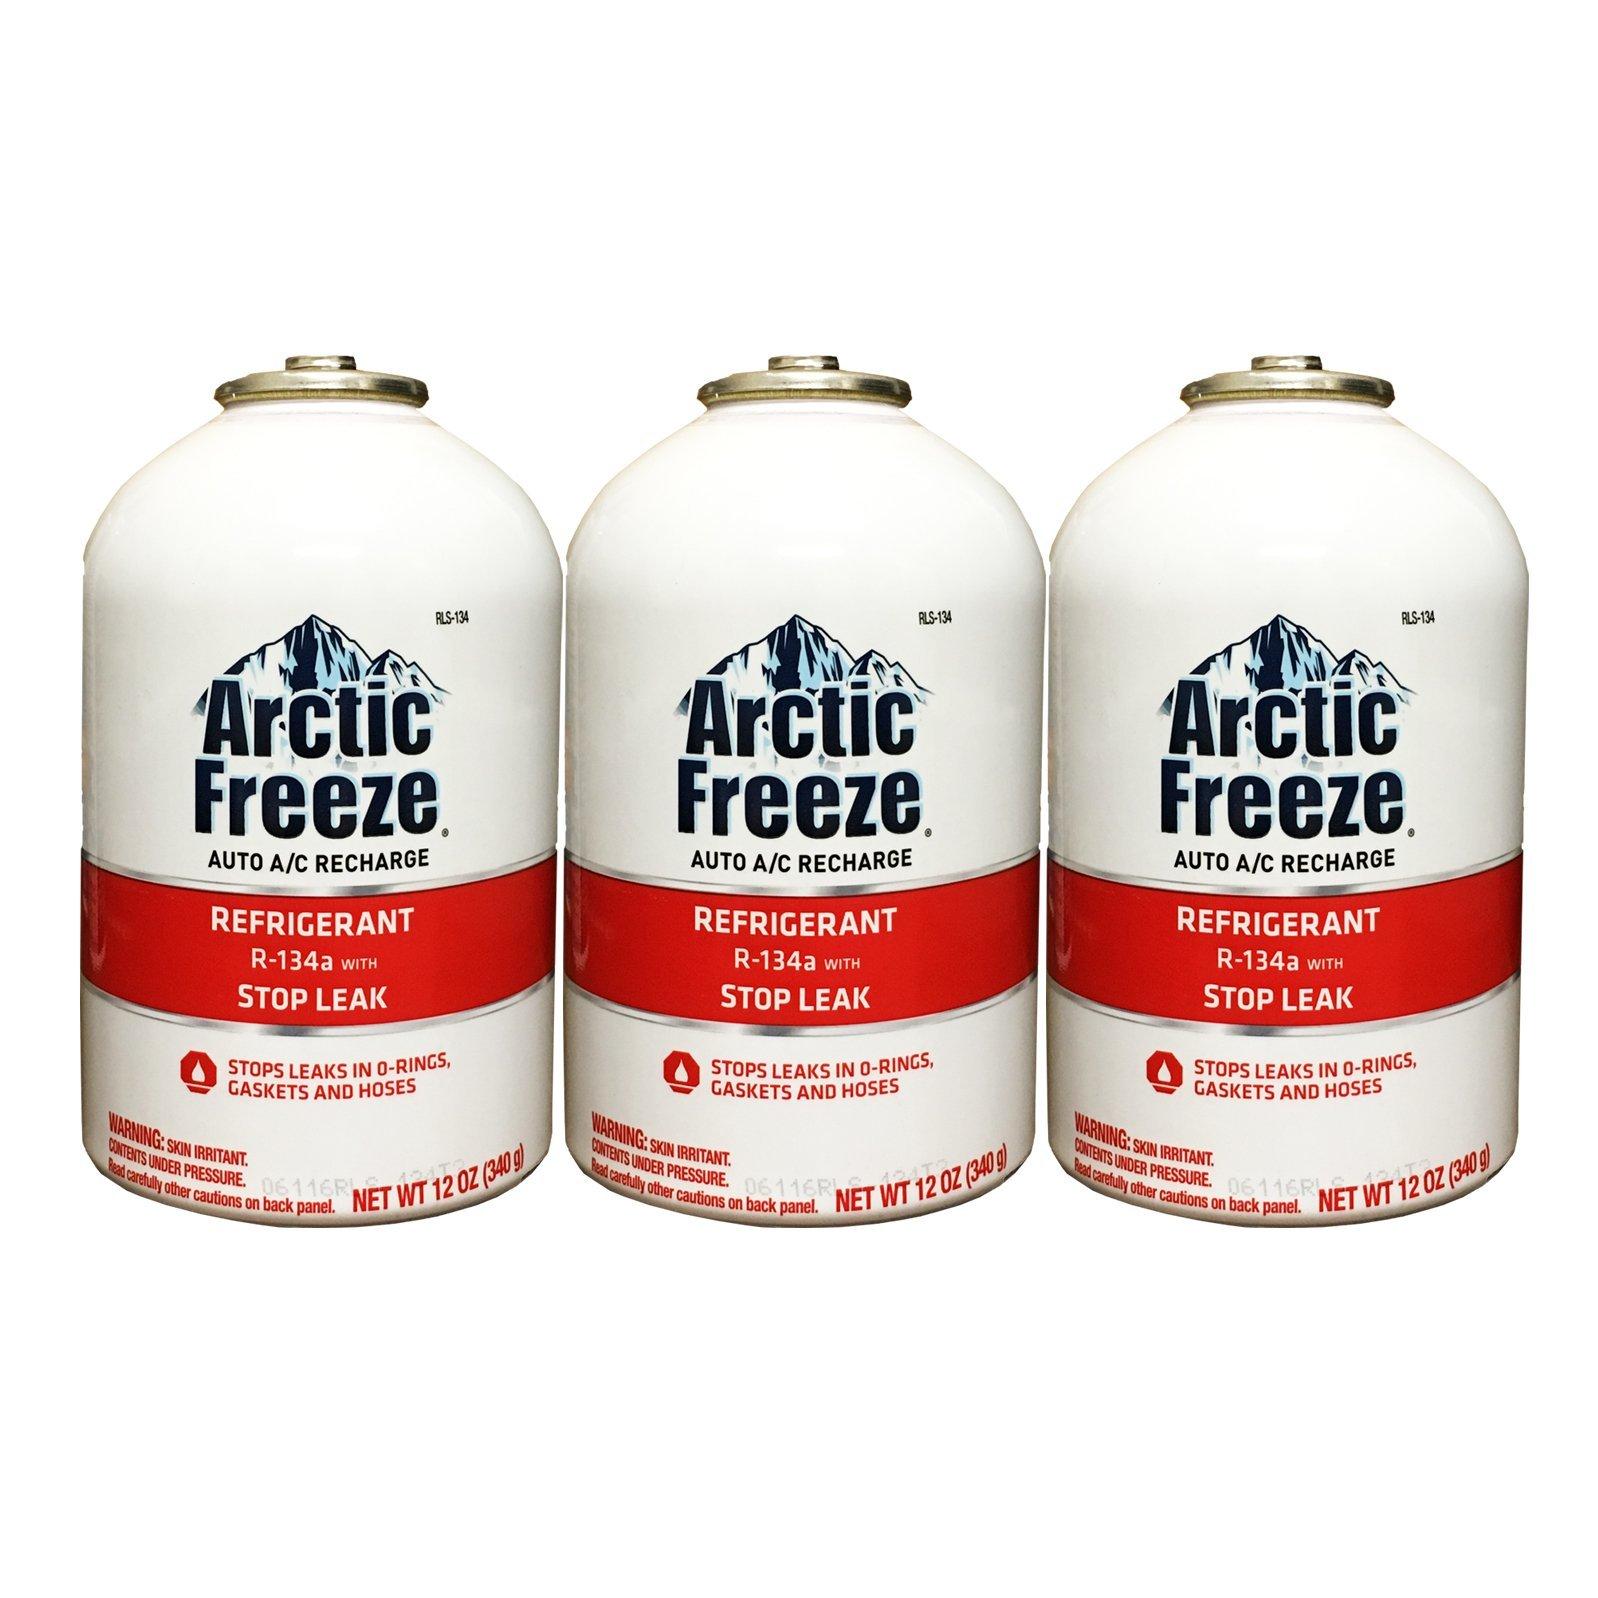 Arctic Freeze (RLS-134T) Refrigerant R-134a with Stop Leak 12 oz (3 Cans)